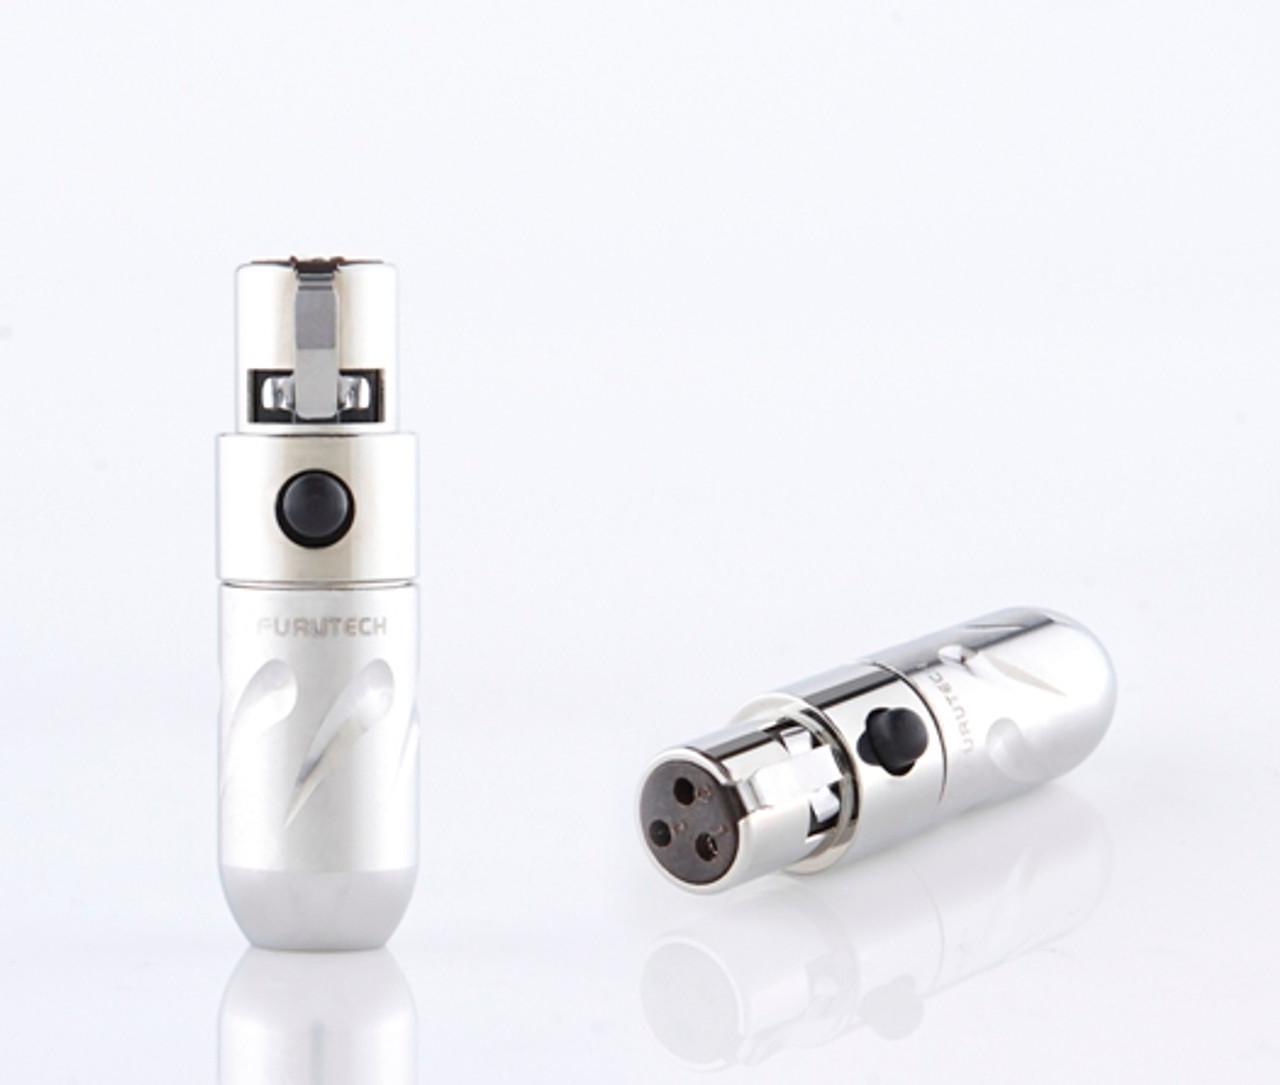 Furutech FT-608mF 3-pin mini XLR plugs